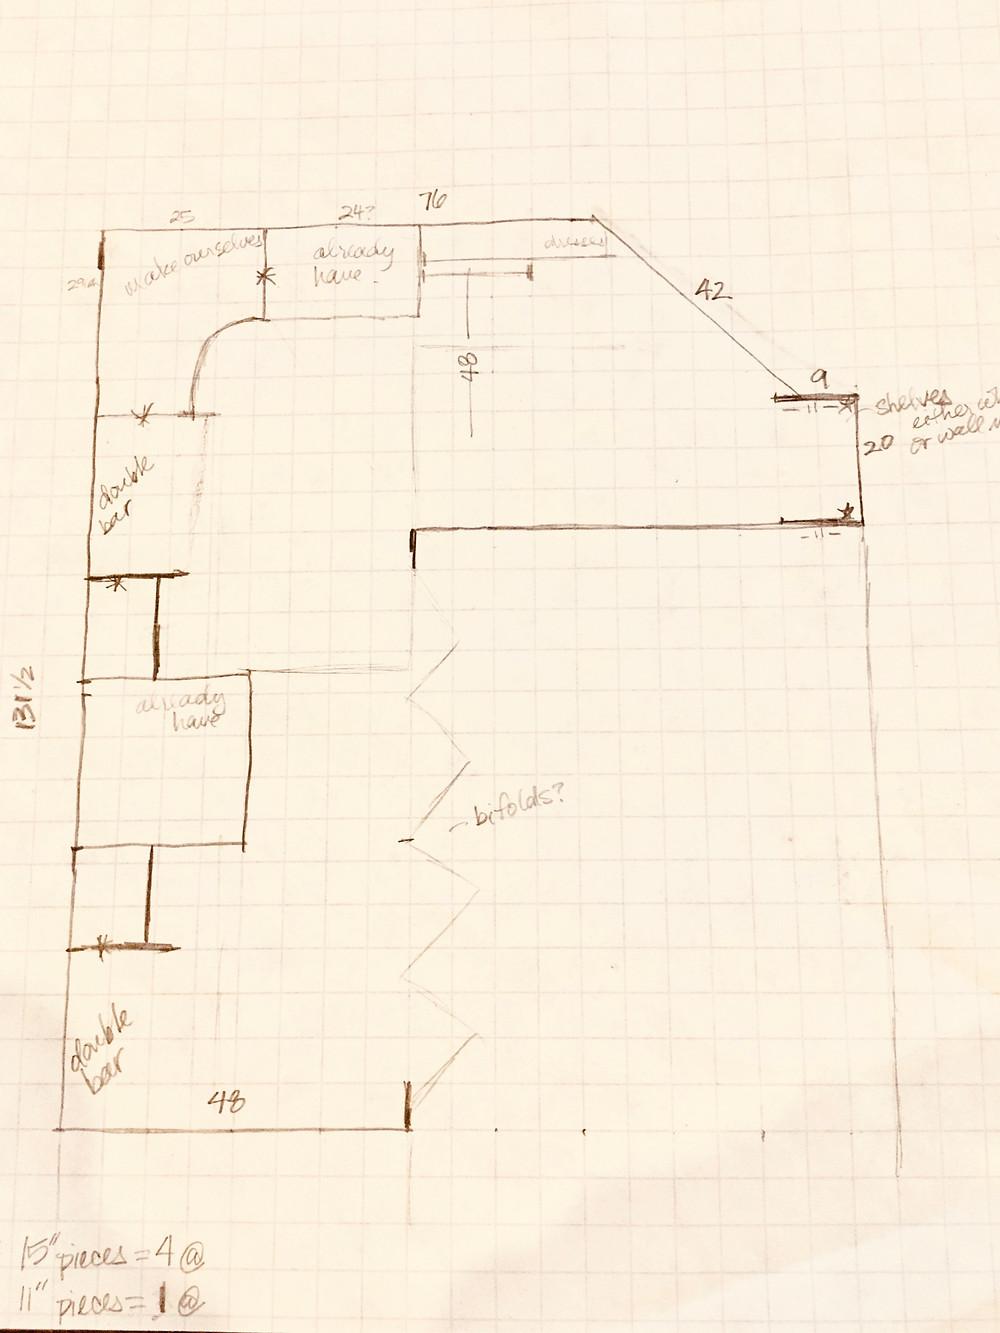 Drawn plans for closet